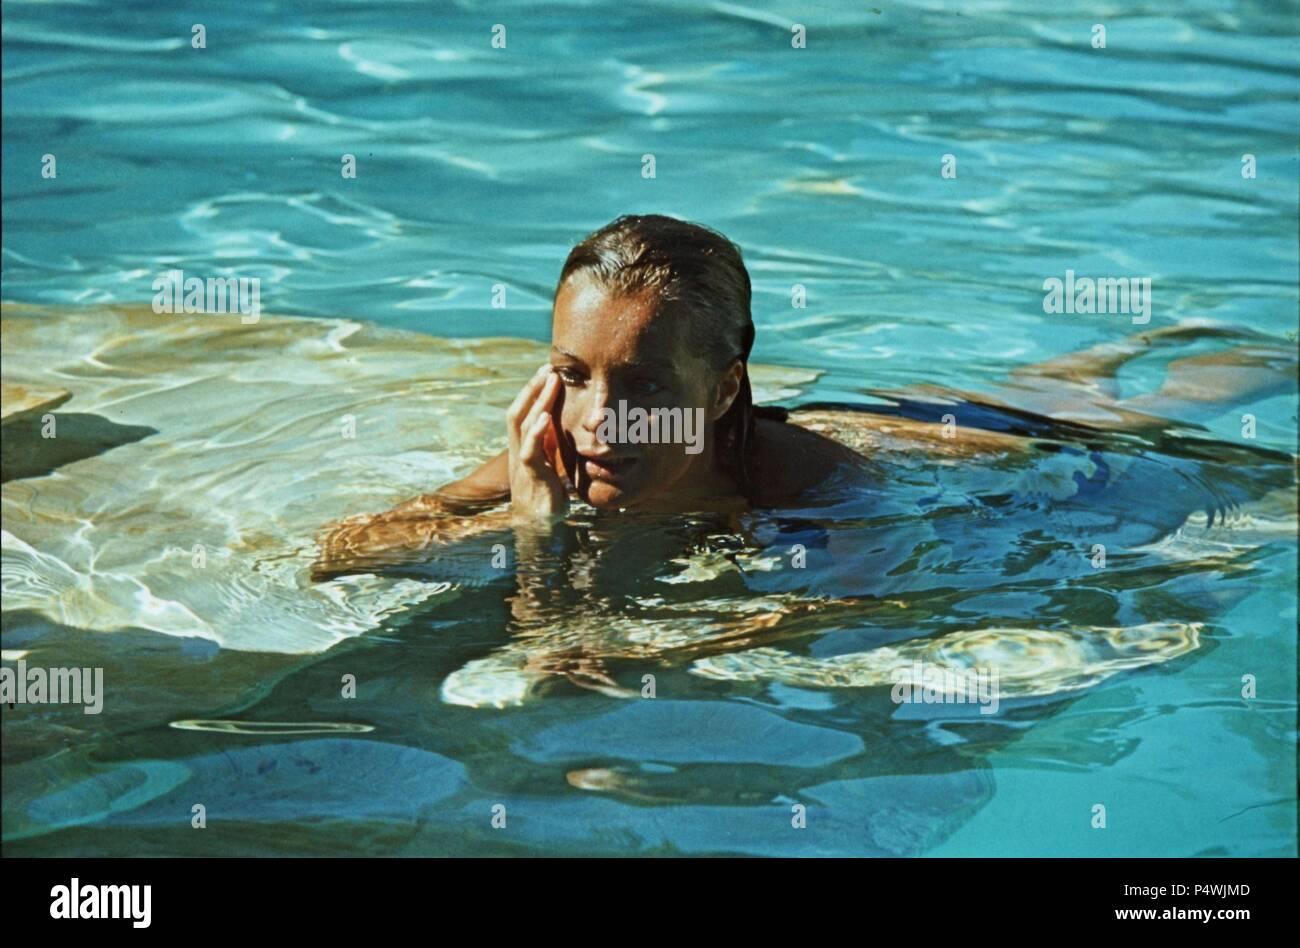 Original Film Title La Piscine English Title Swimming Pool The Film Director Jacques Deray